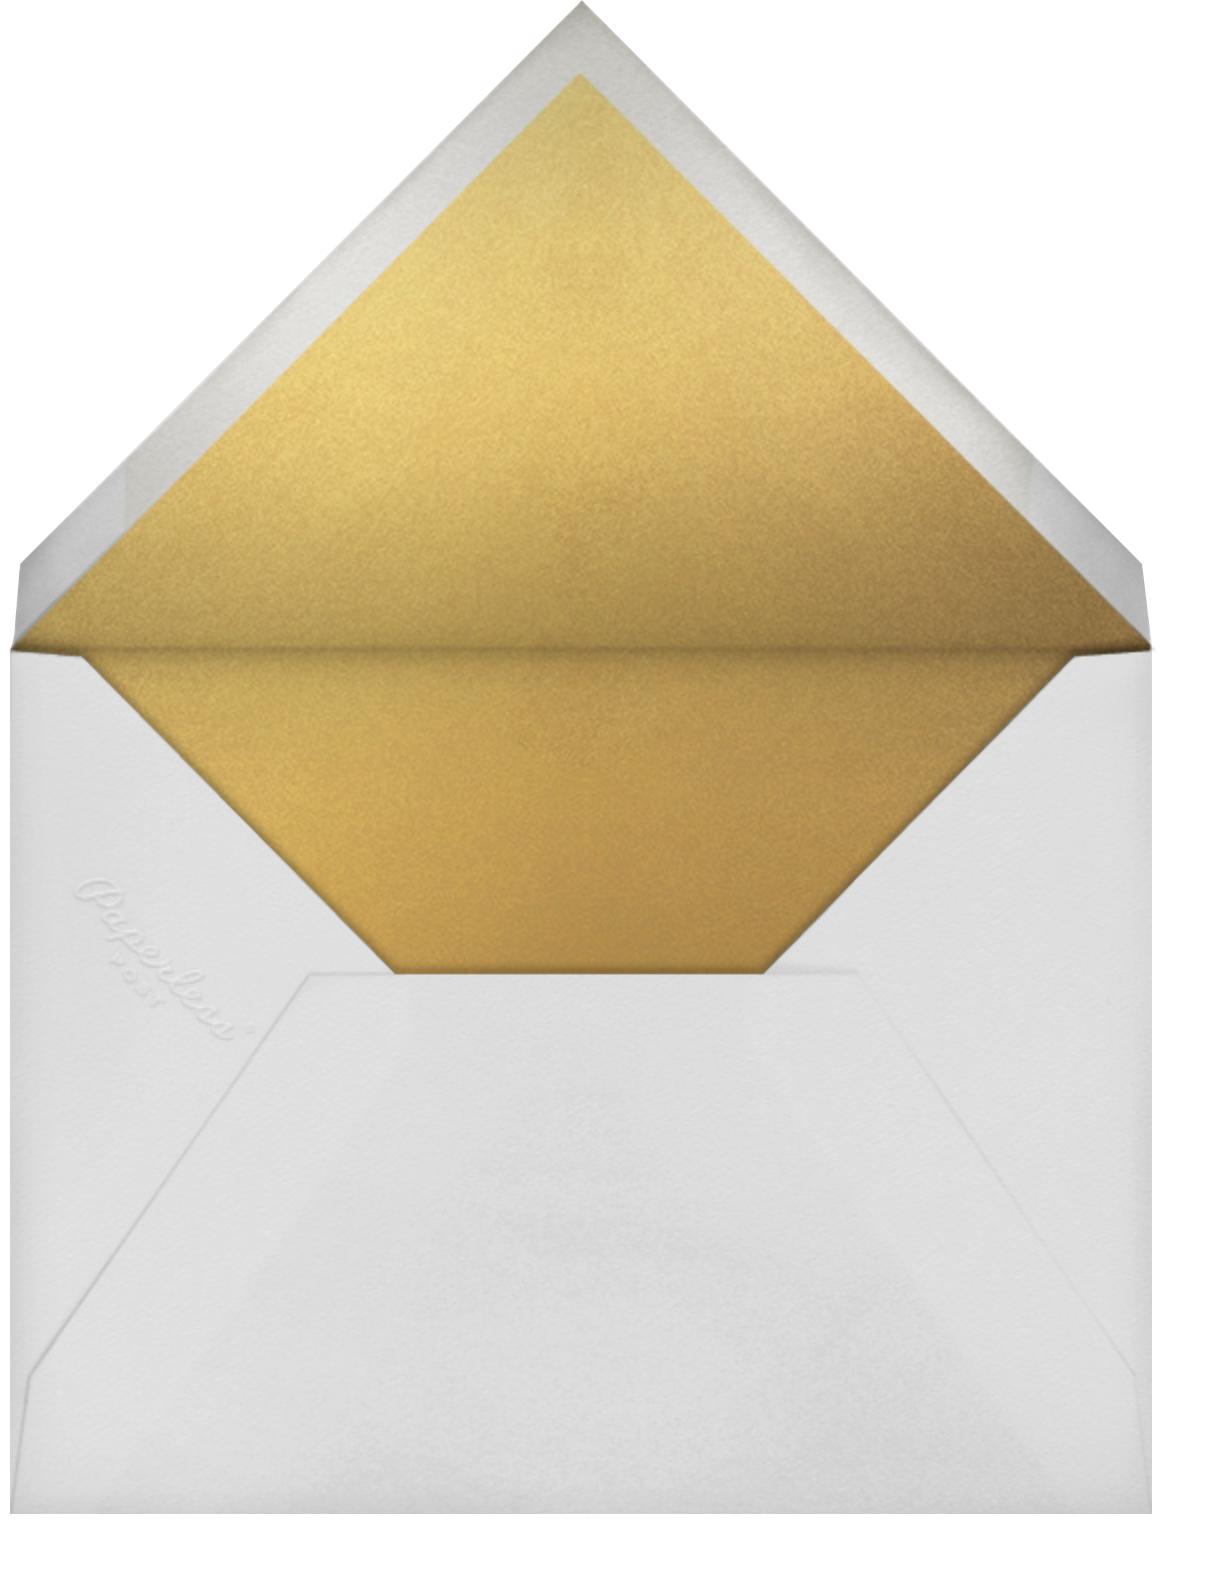 Grateful Celebration - Cheree Berry Paper & Design - Envelope